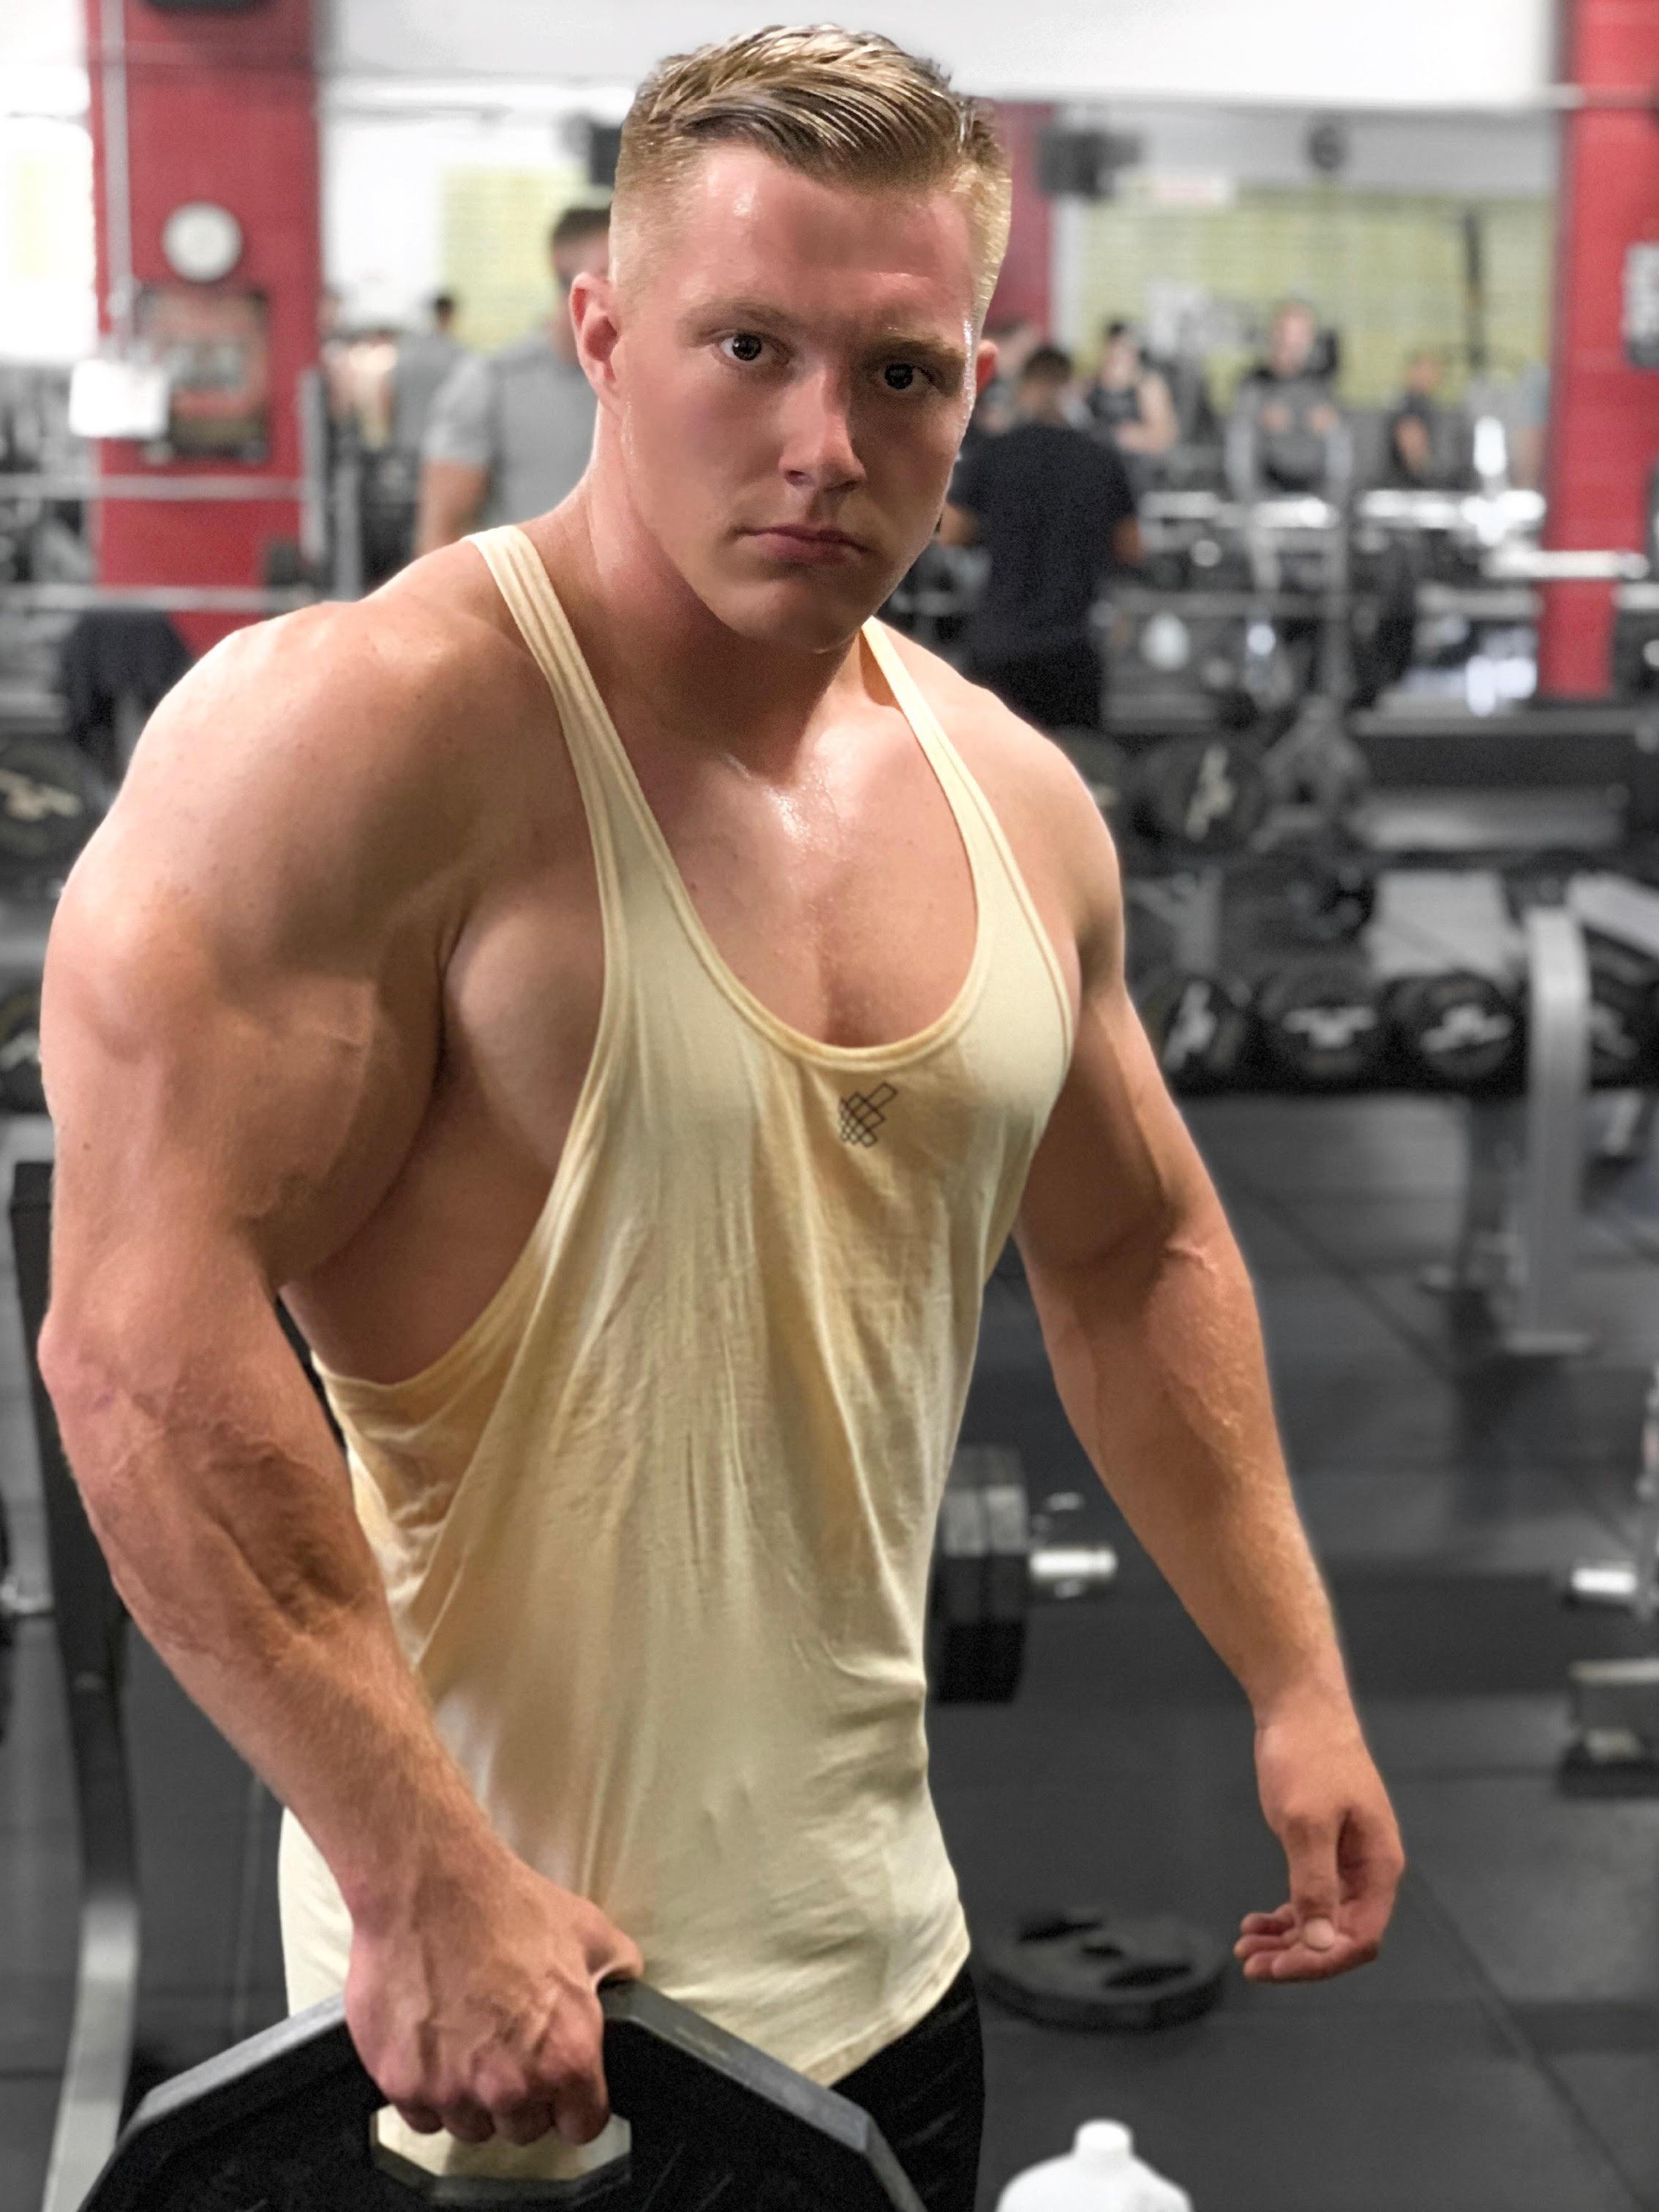 Tyler Valenzia